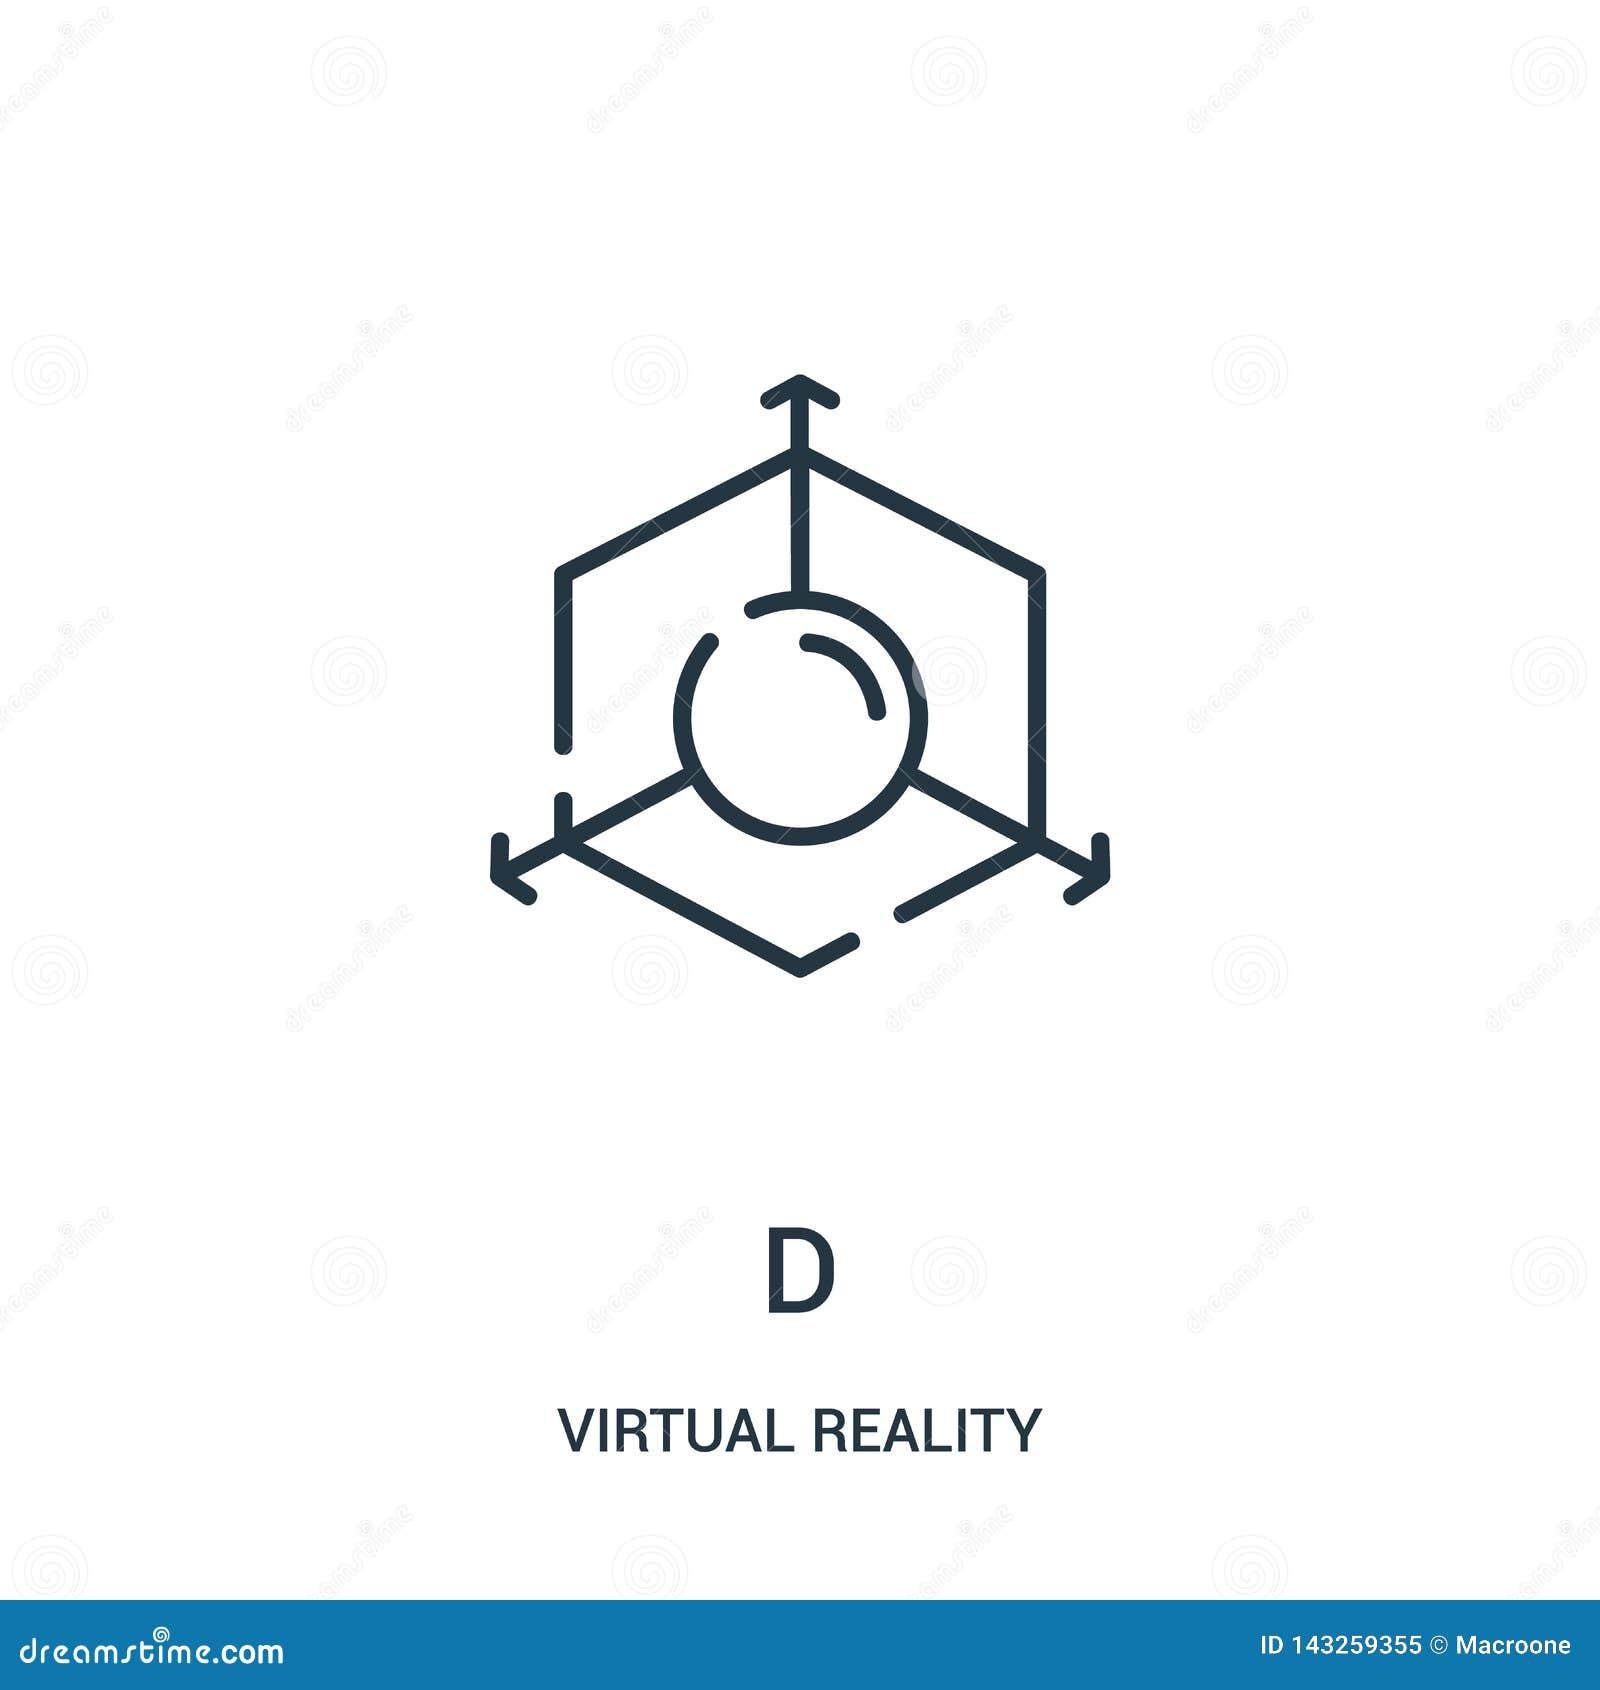 Vector del icono de d de la colecci?n de la realidad virtual L?nea fina ejemplo del vector del icono del esquema de d